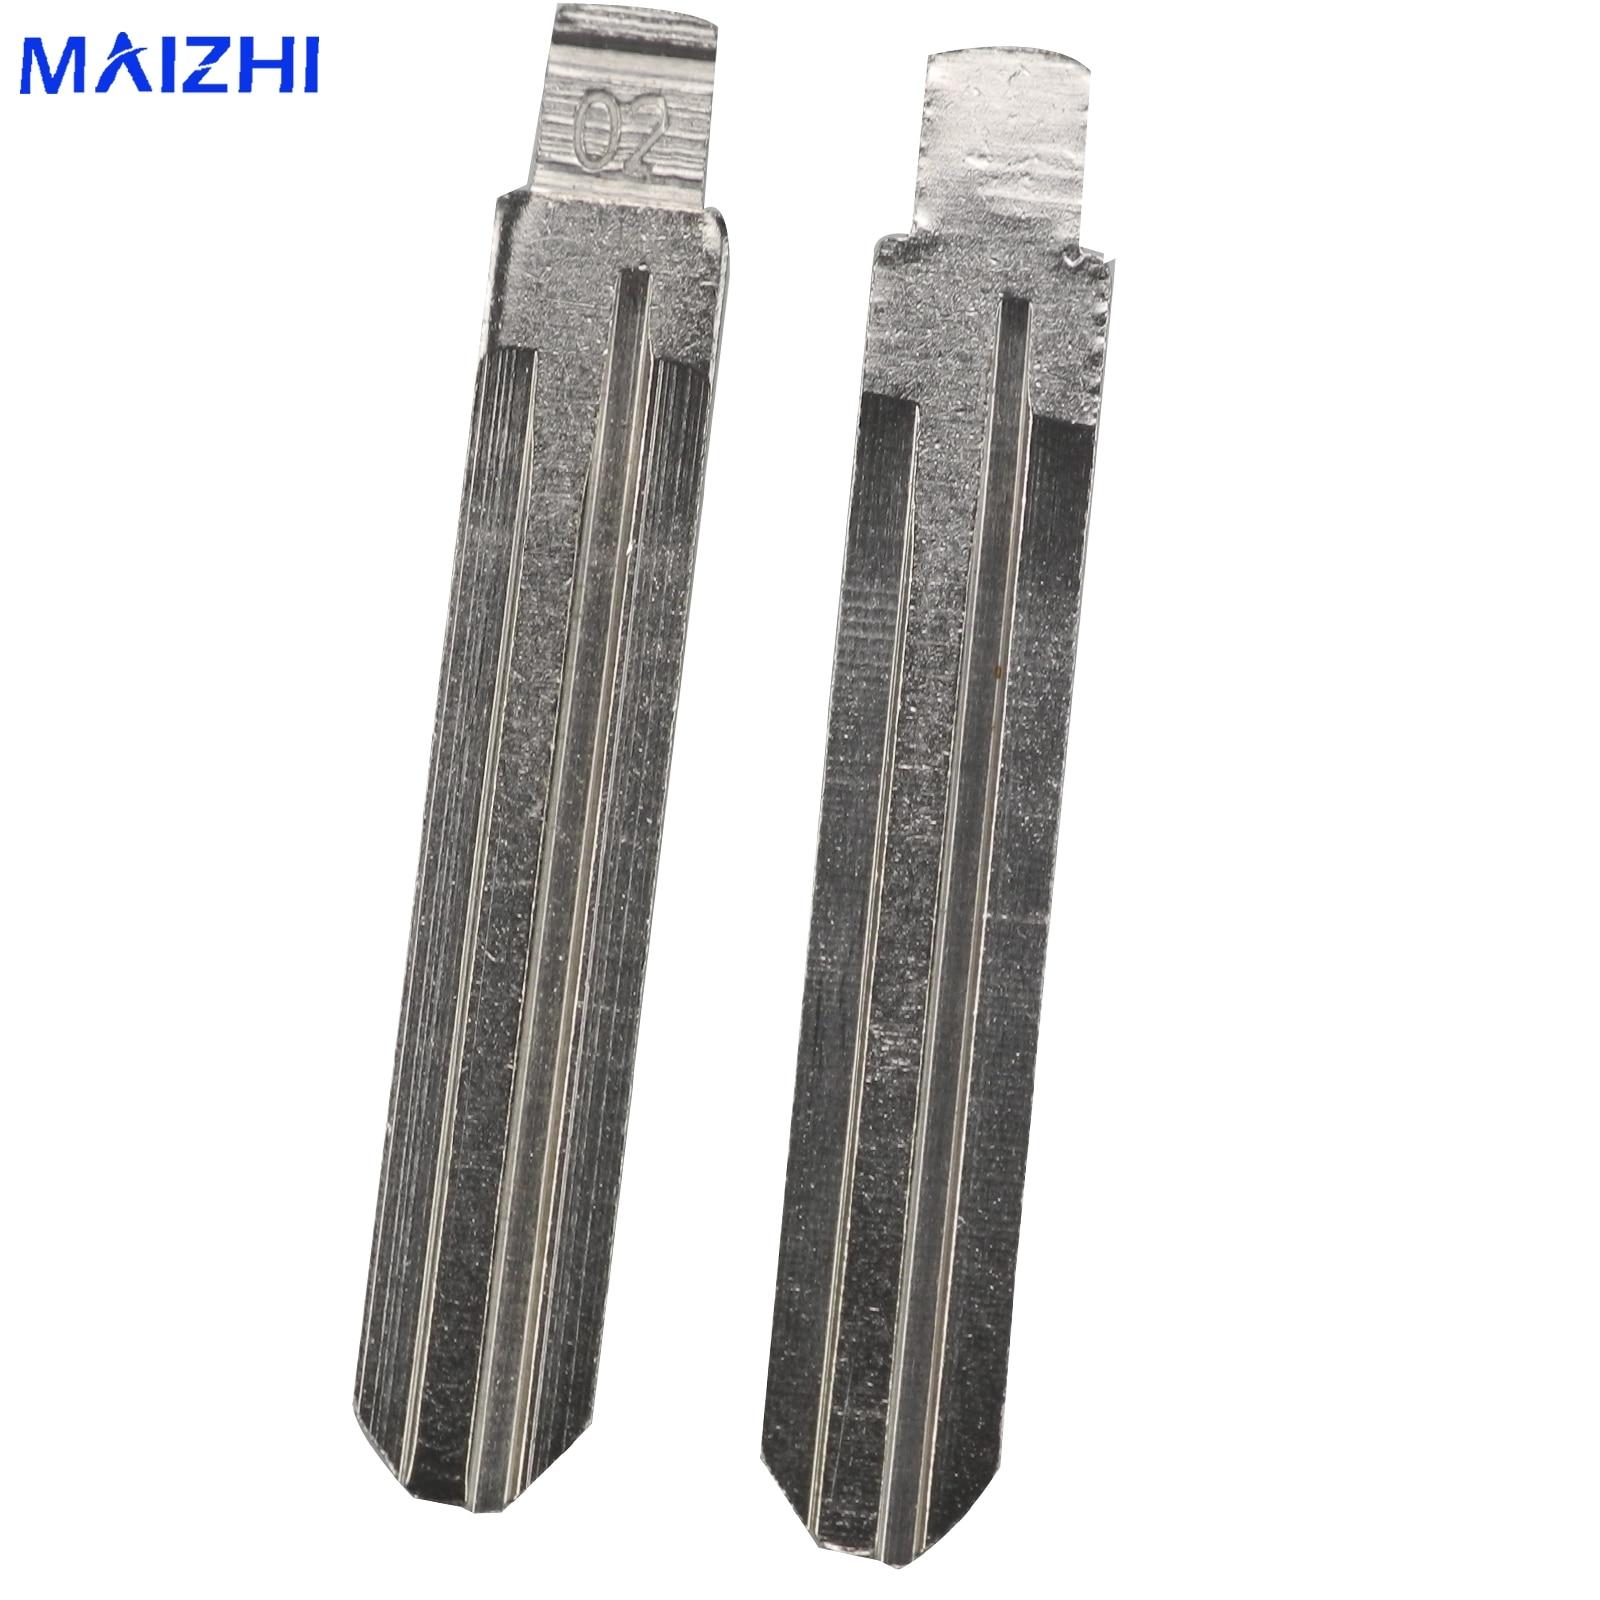 maizhi 10pcs Car Flid Folding NO.02 Key Blank For Toyota Crown Camry Corolla Highlander Corolla Vios Fukuda Auman Styling